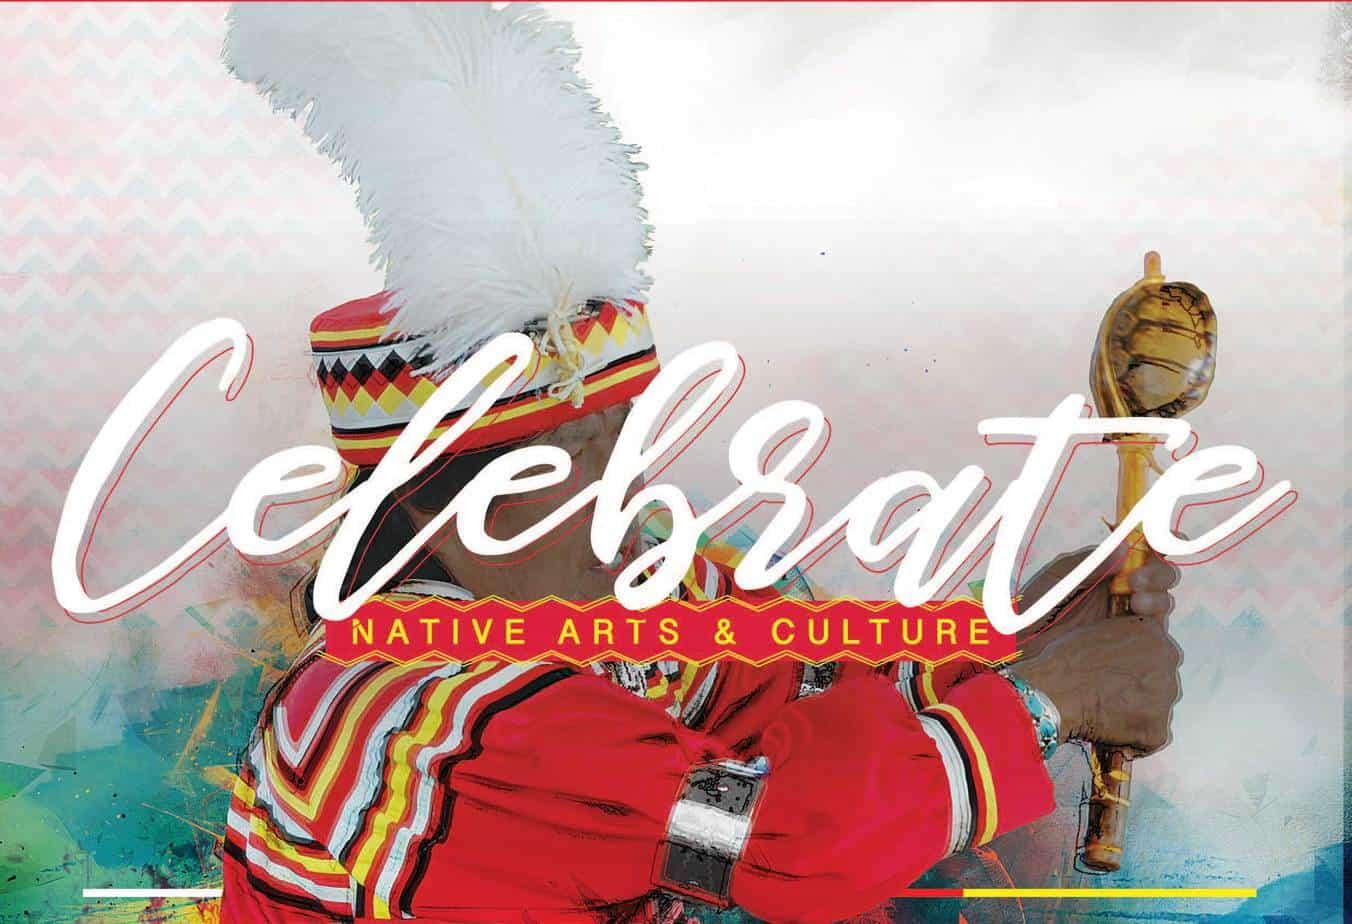 american indian fest logo Seminoles American Indian Arts Celebration: Nov. 6-7, 2020